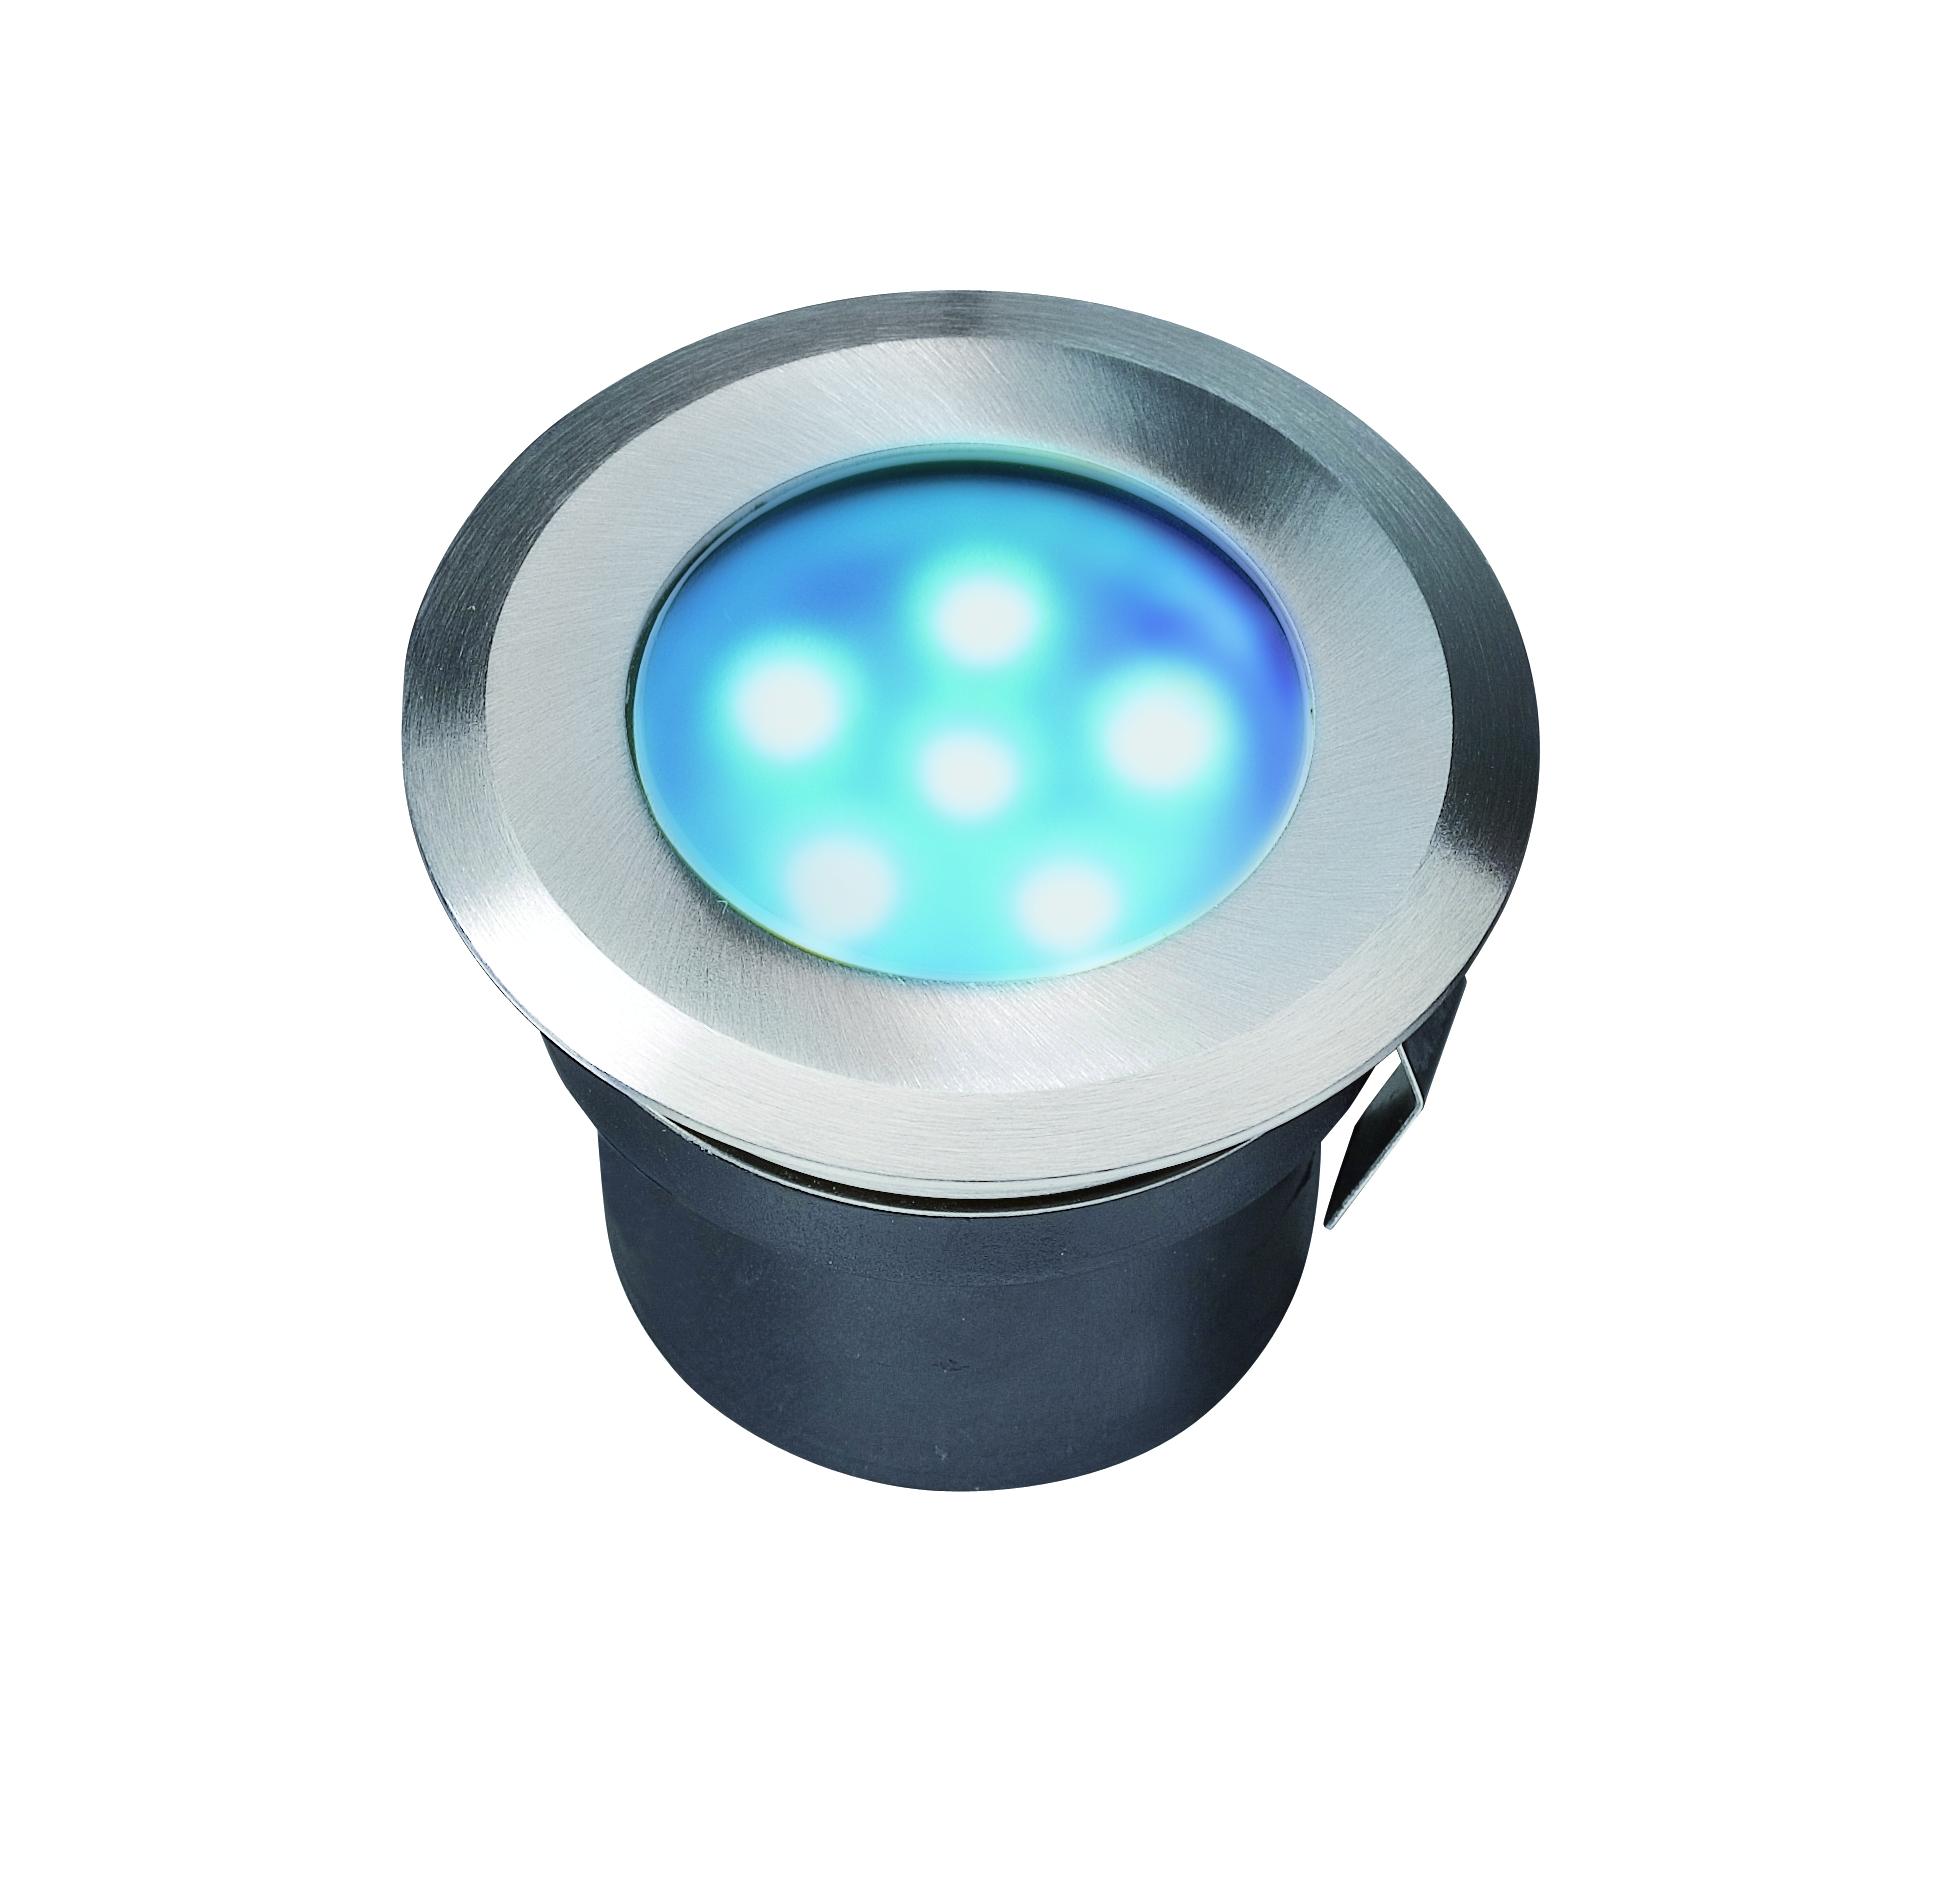 Garden Lights LED Sirius Blauw kopen? Grondspot LED Verlichting ...